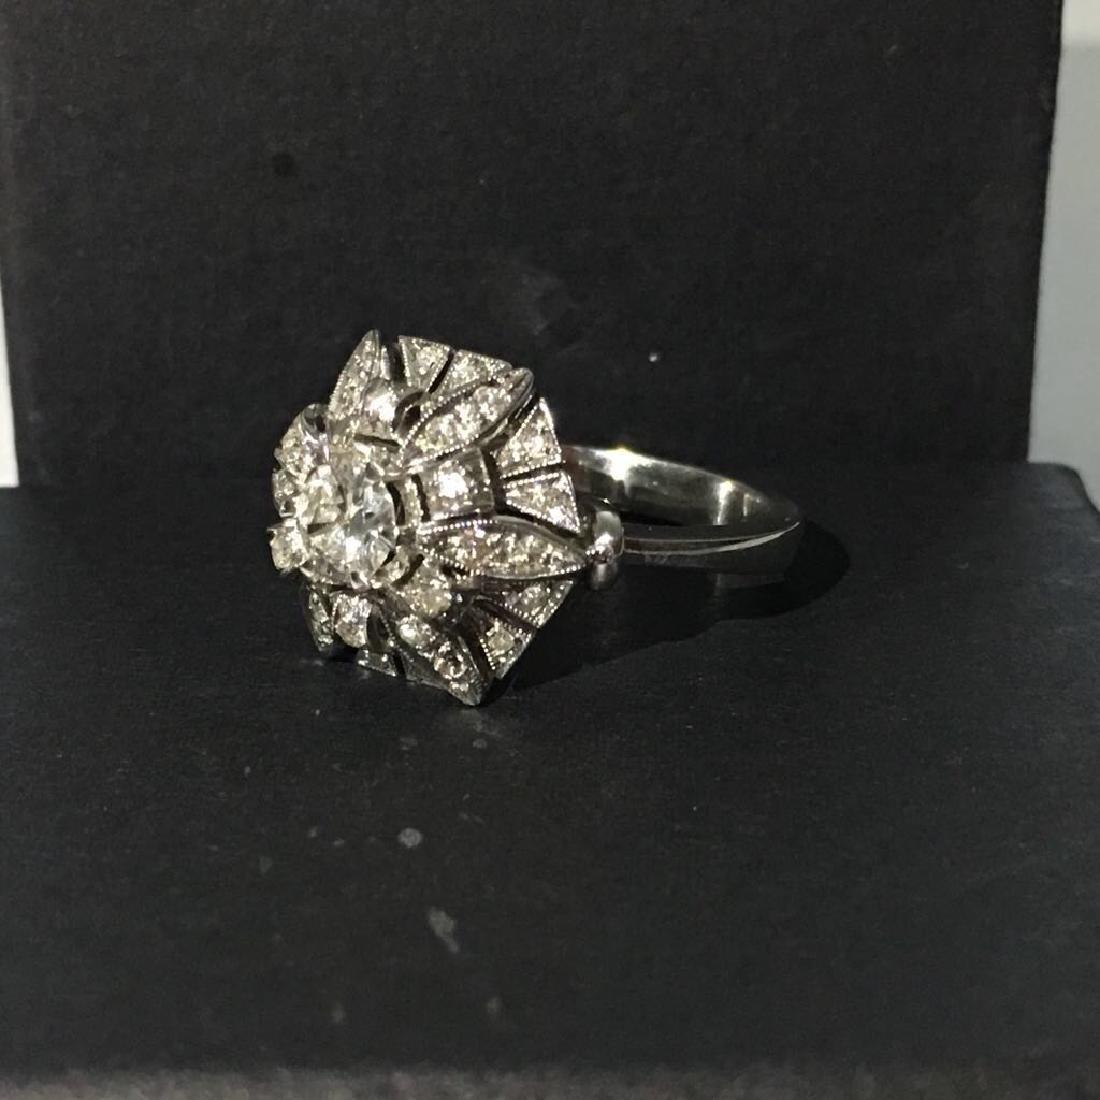 18K White Gold, 2.05 Carat VS-G Vintage Diamond Ring - 3